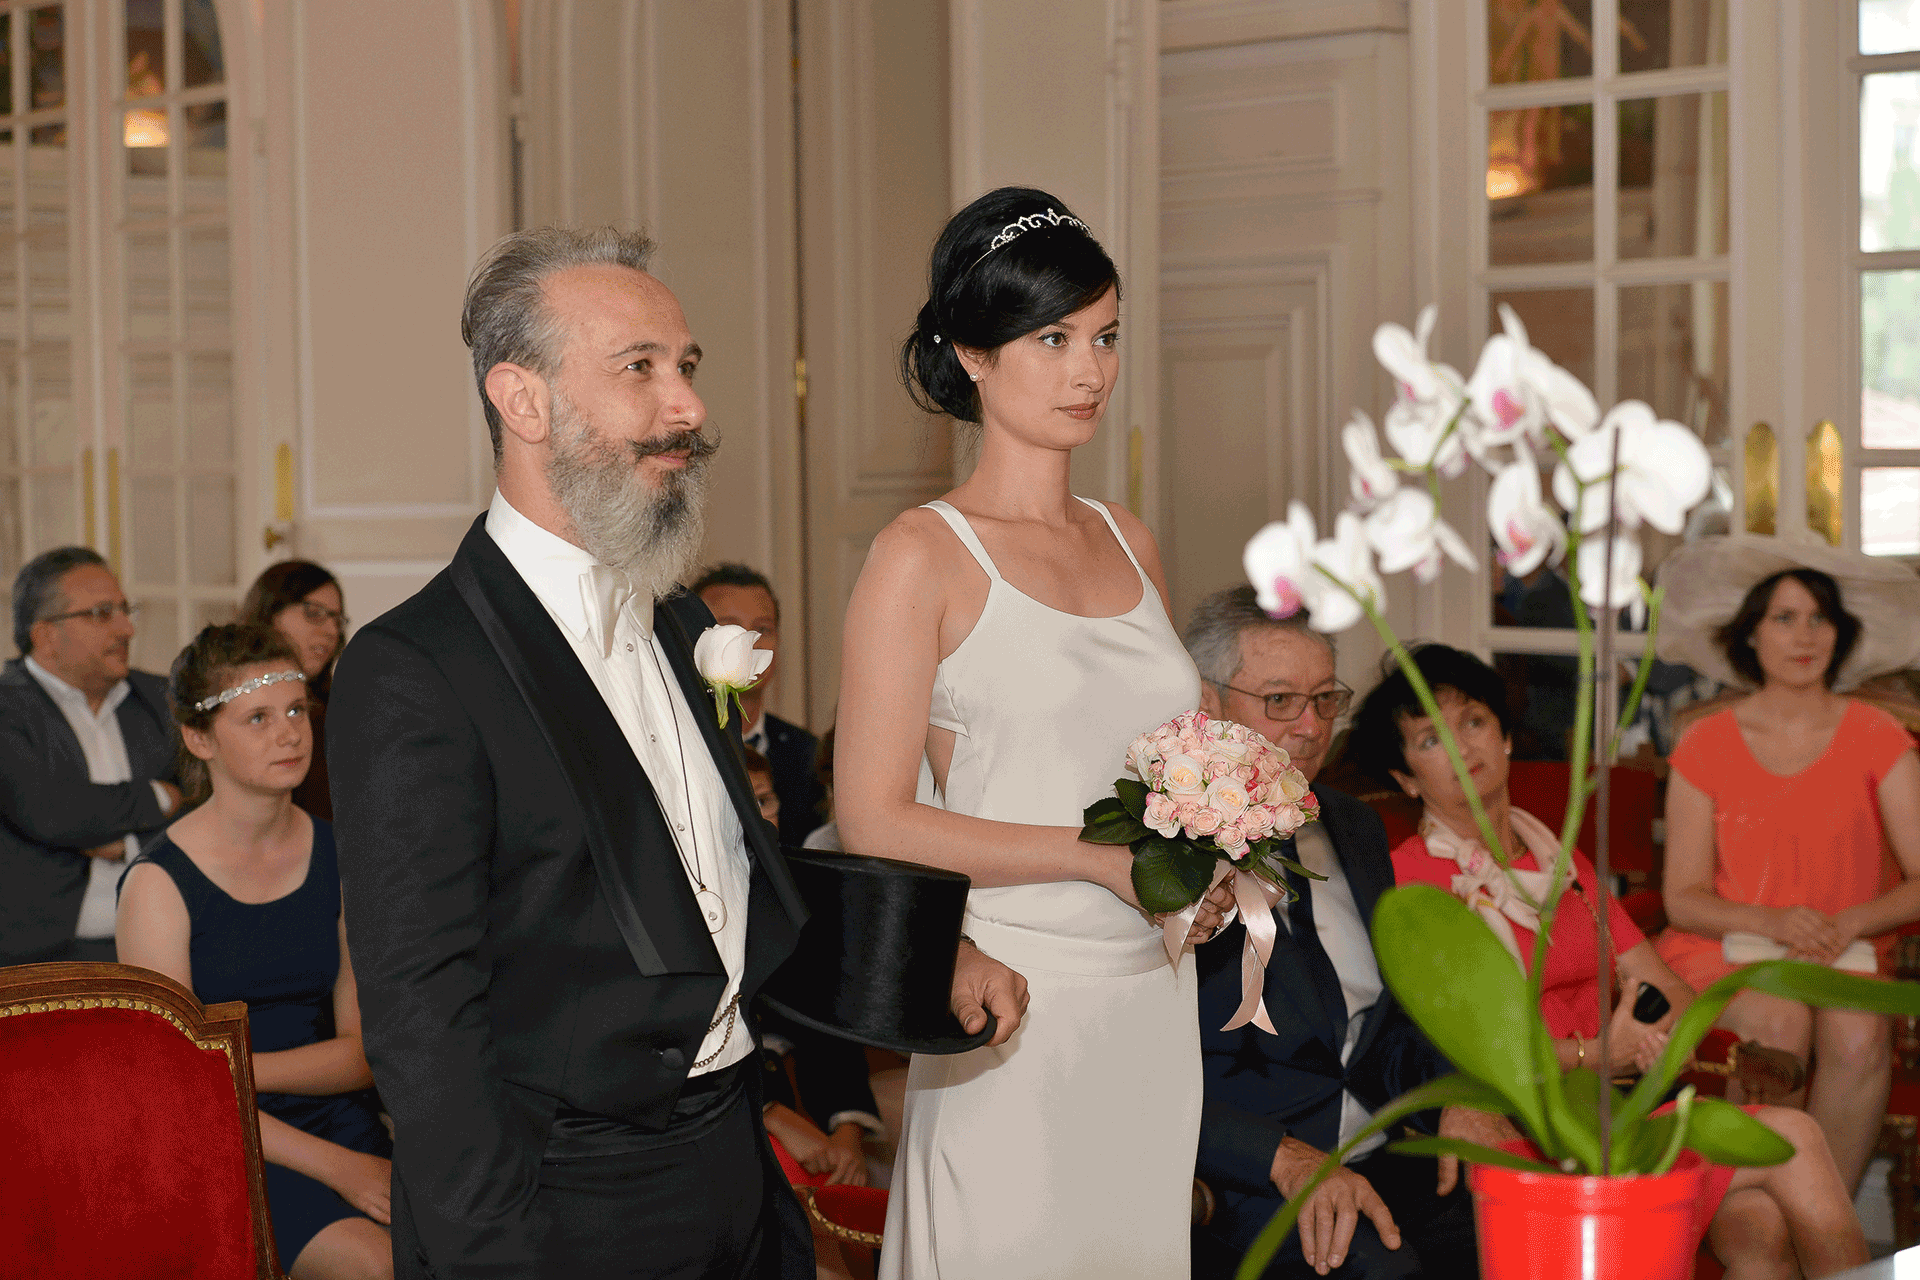 photographe-mariage-ile-de-france-mairie-neuilly-sur-seine